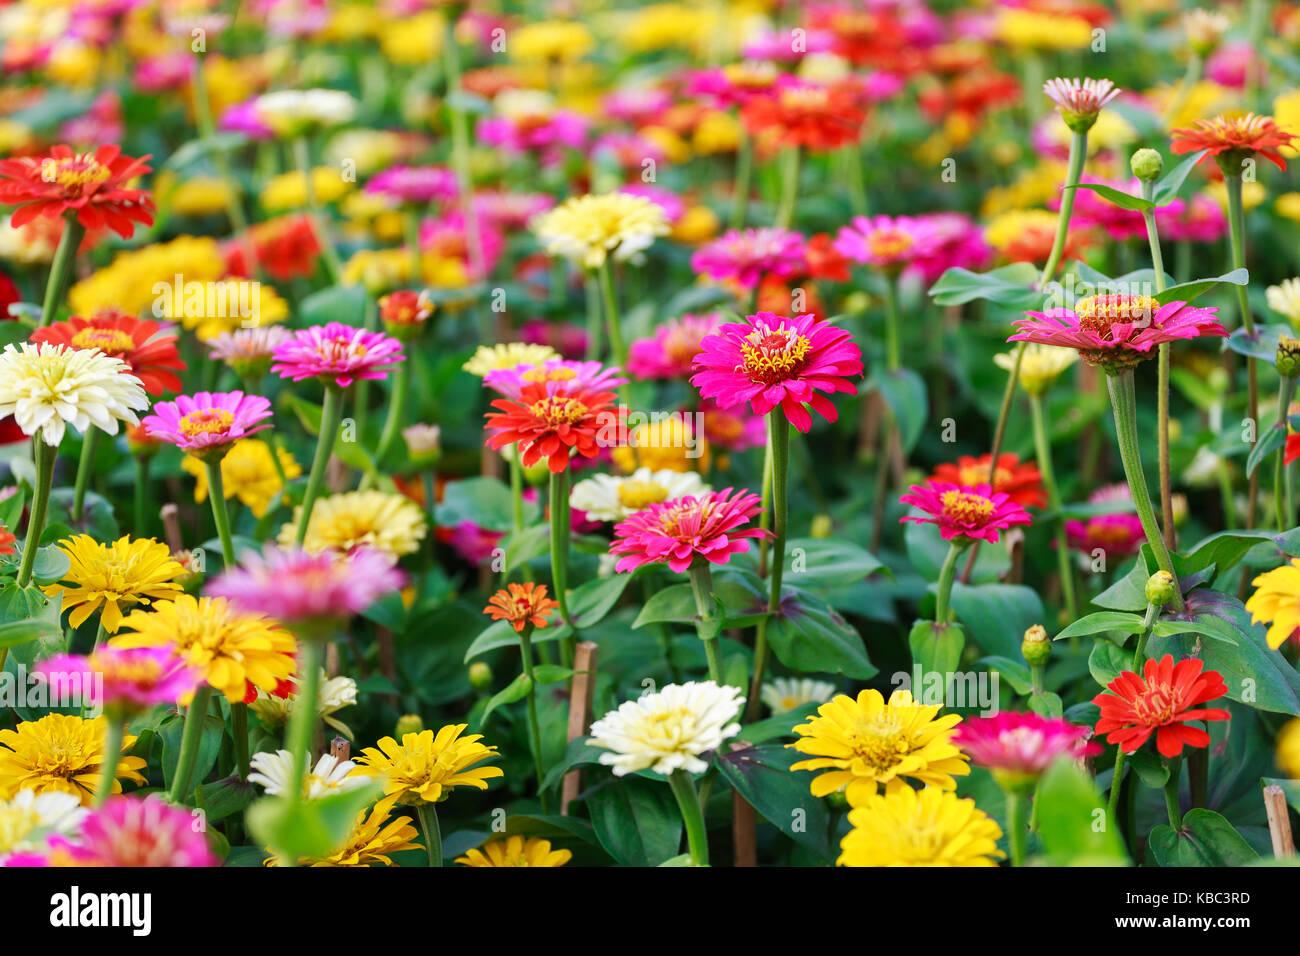 Binh Dong Floating Flower Market.Beautiful Colorful Gerbera Hoa Dong Tien Flowers In Spring Binh